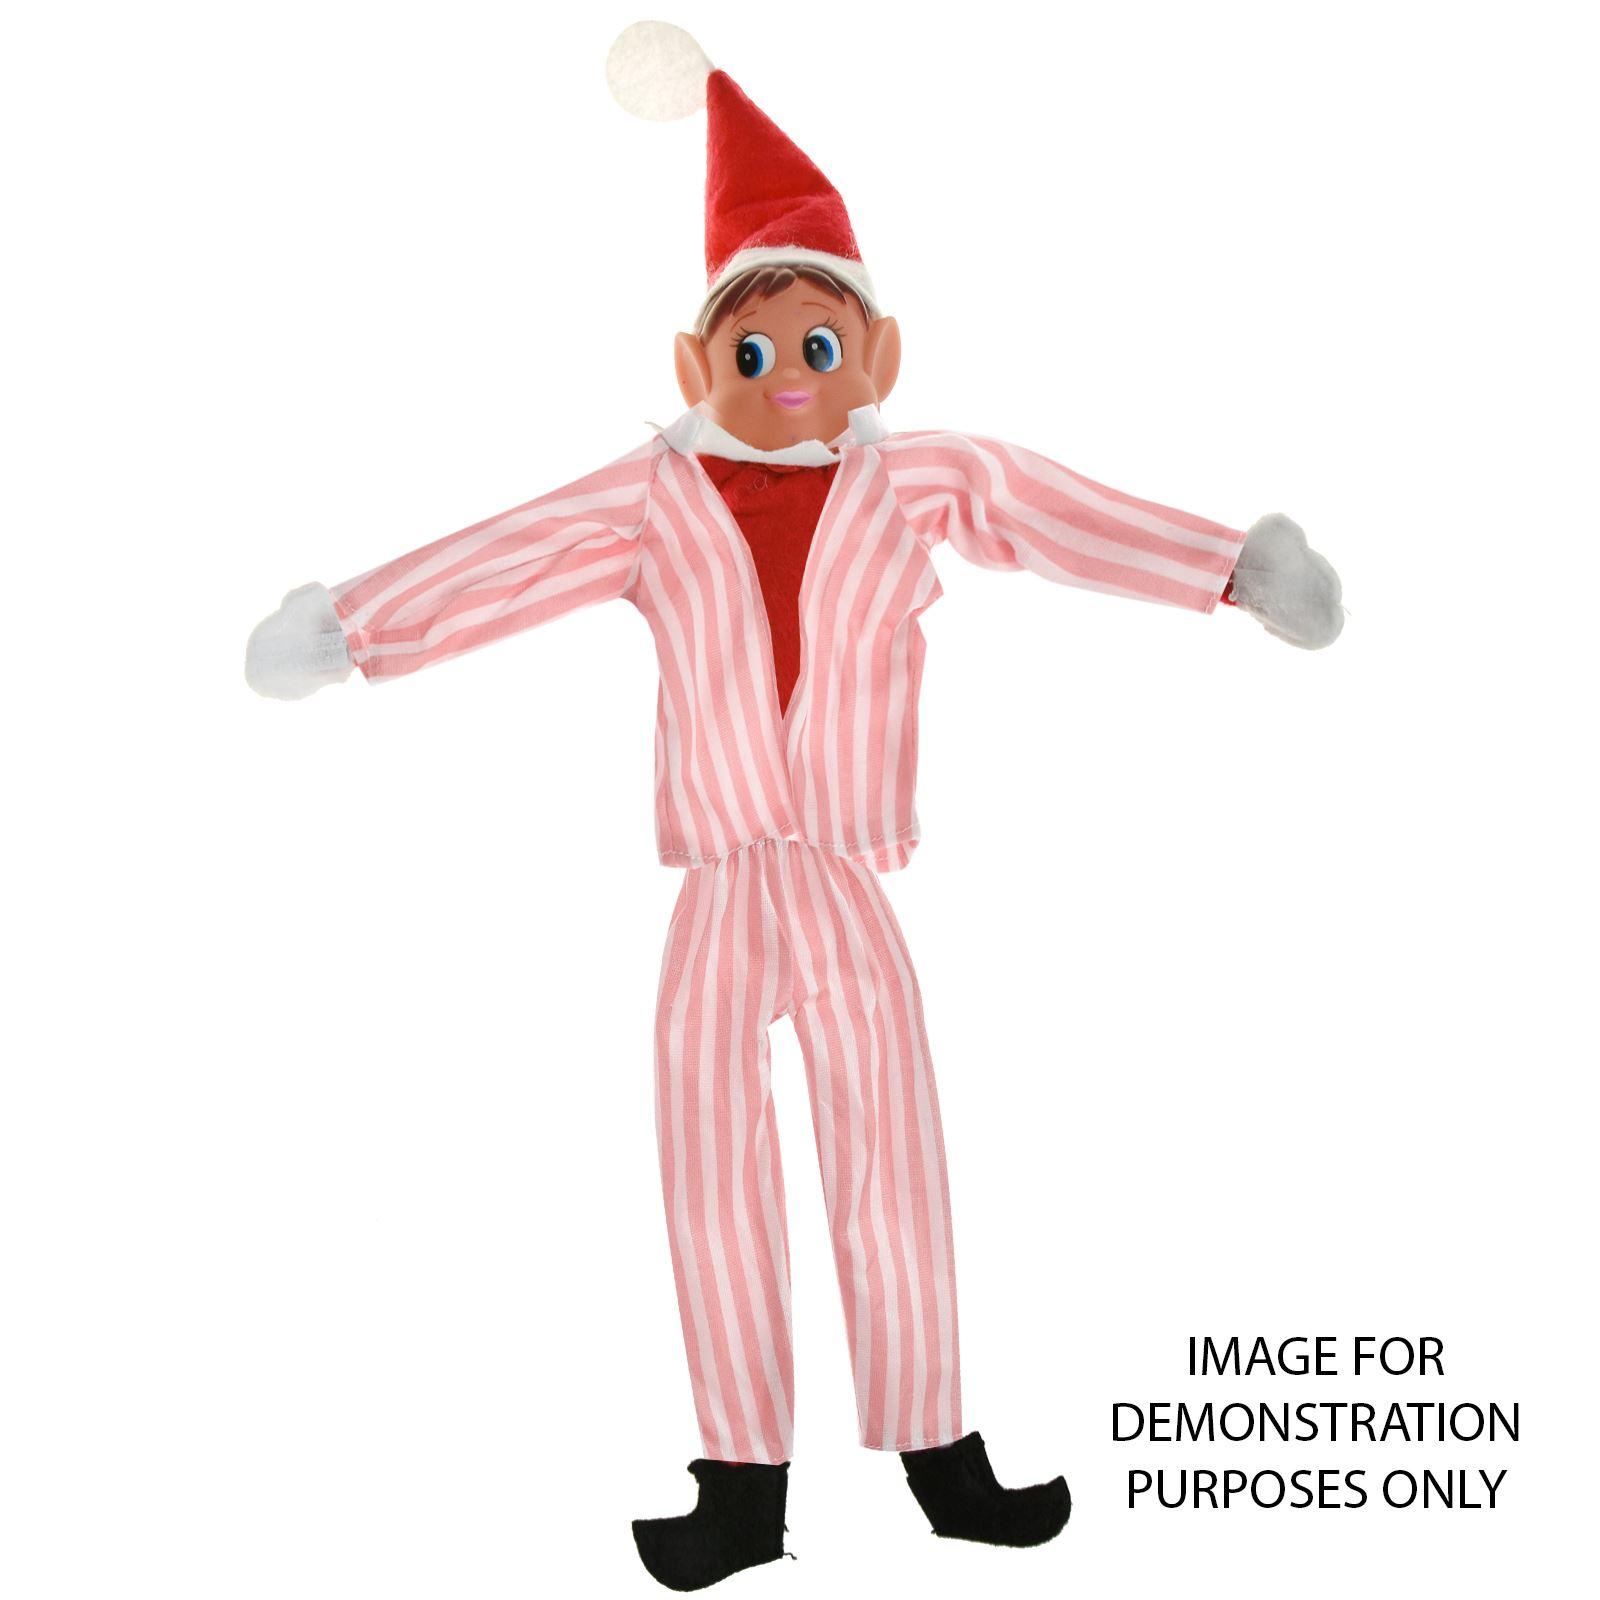 Naughty-ELF-Pigiama-Elfi-latitanti-034-Male-Blu-Rosa-Natale-Novita-Natale-Prop miniatura 4